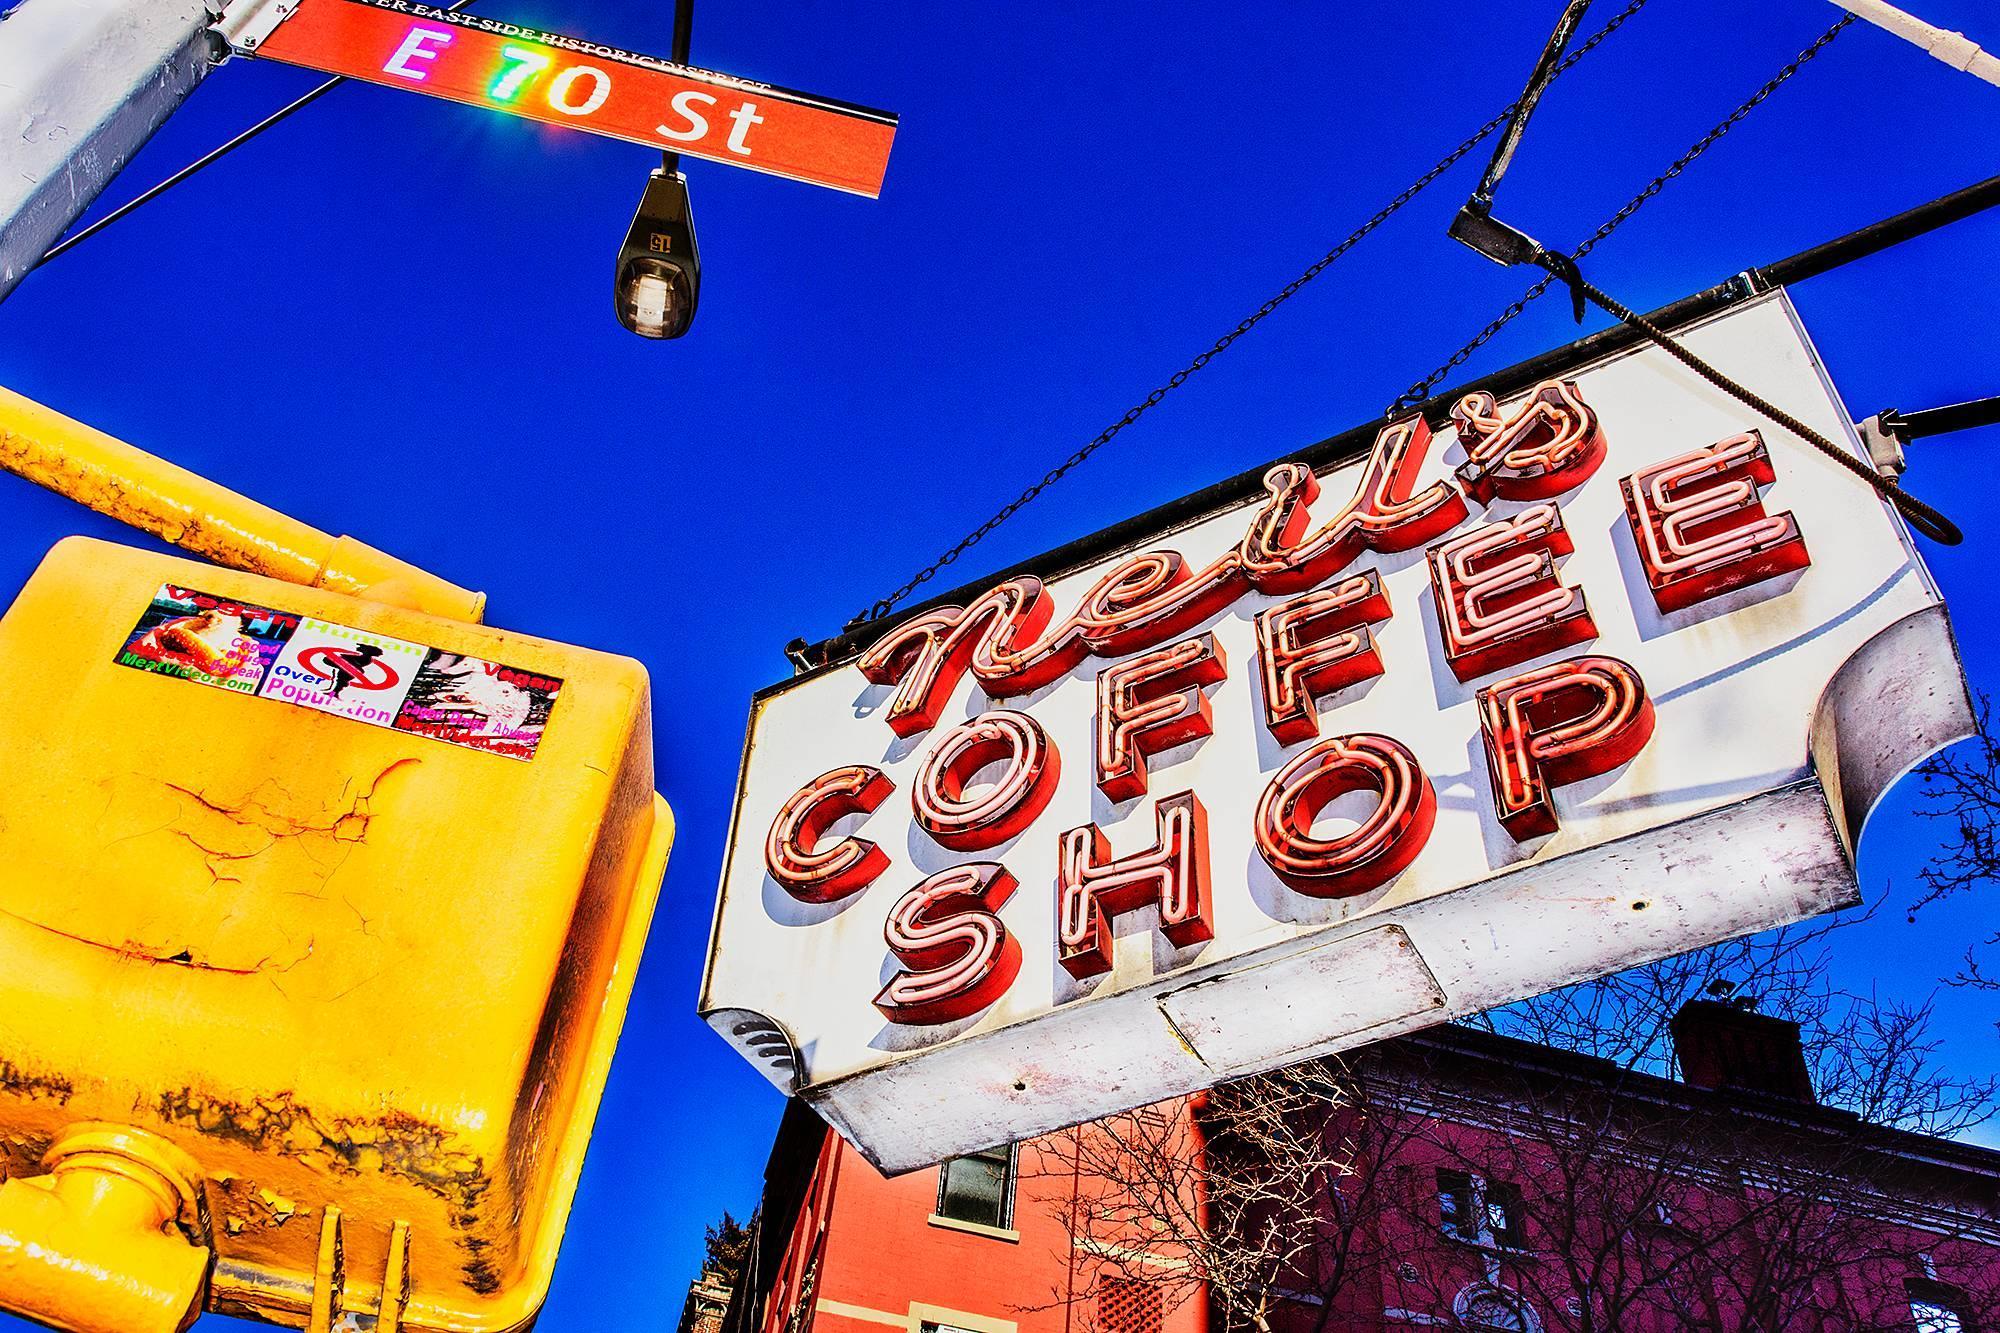 Neil's Coffee Shop